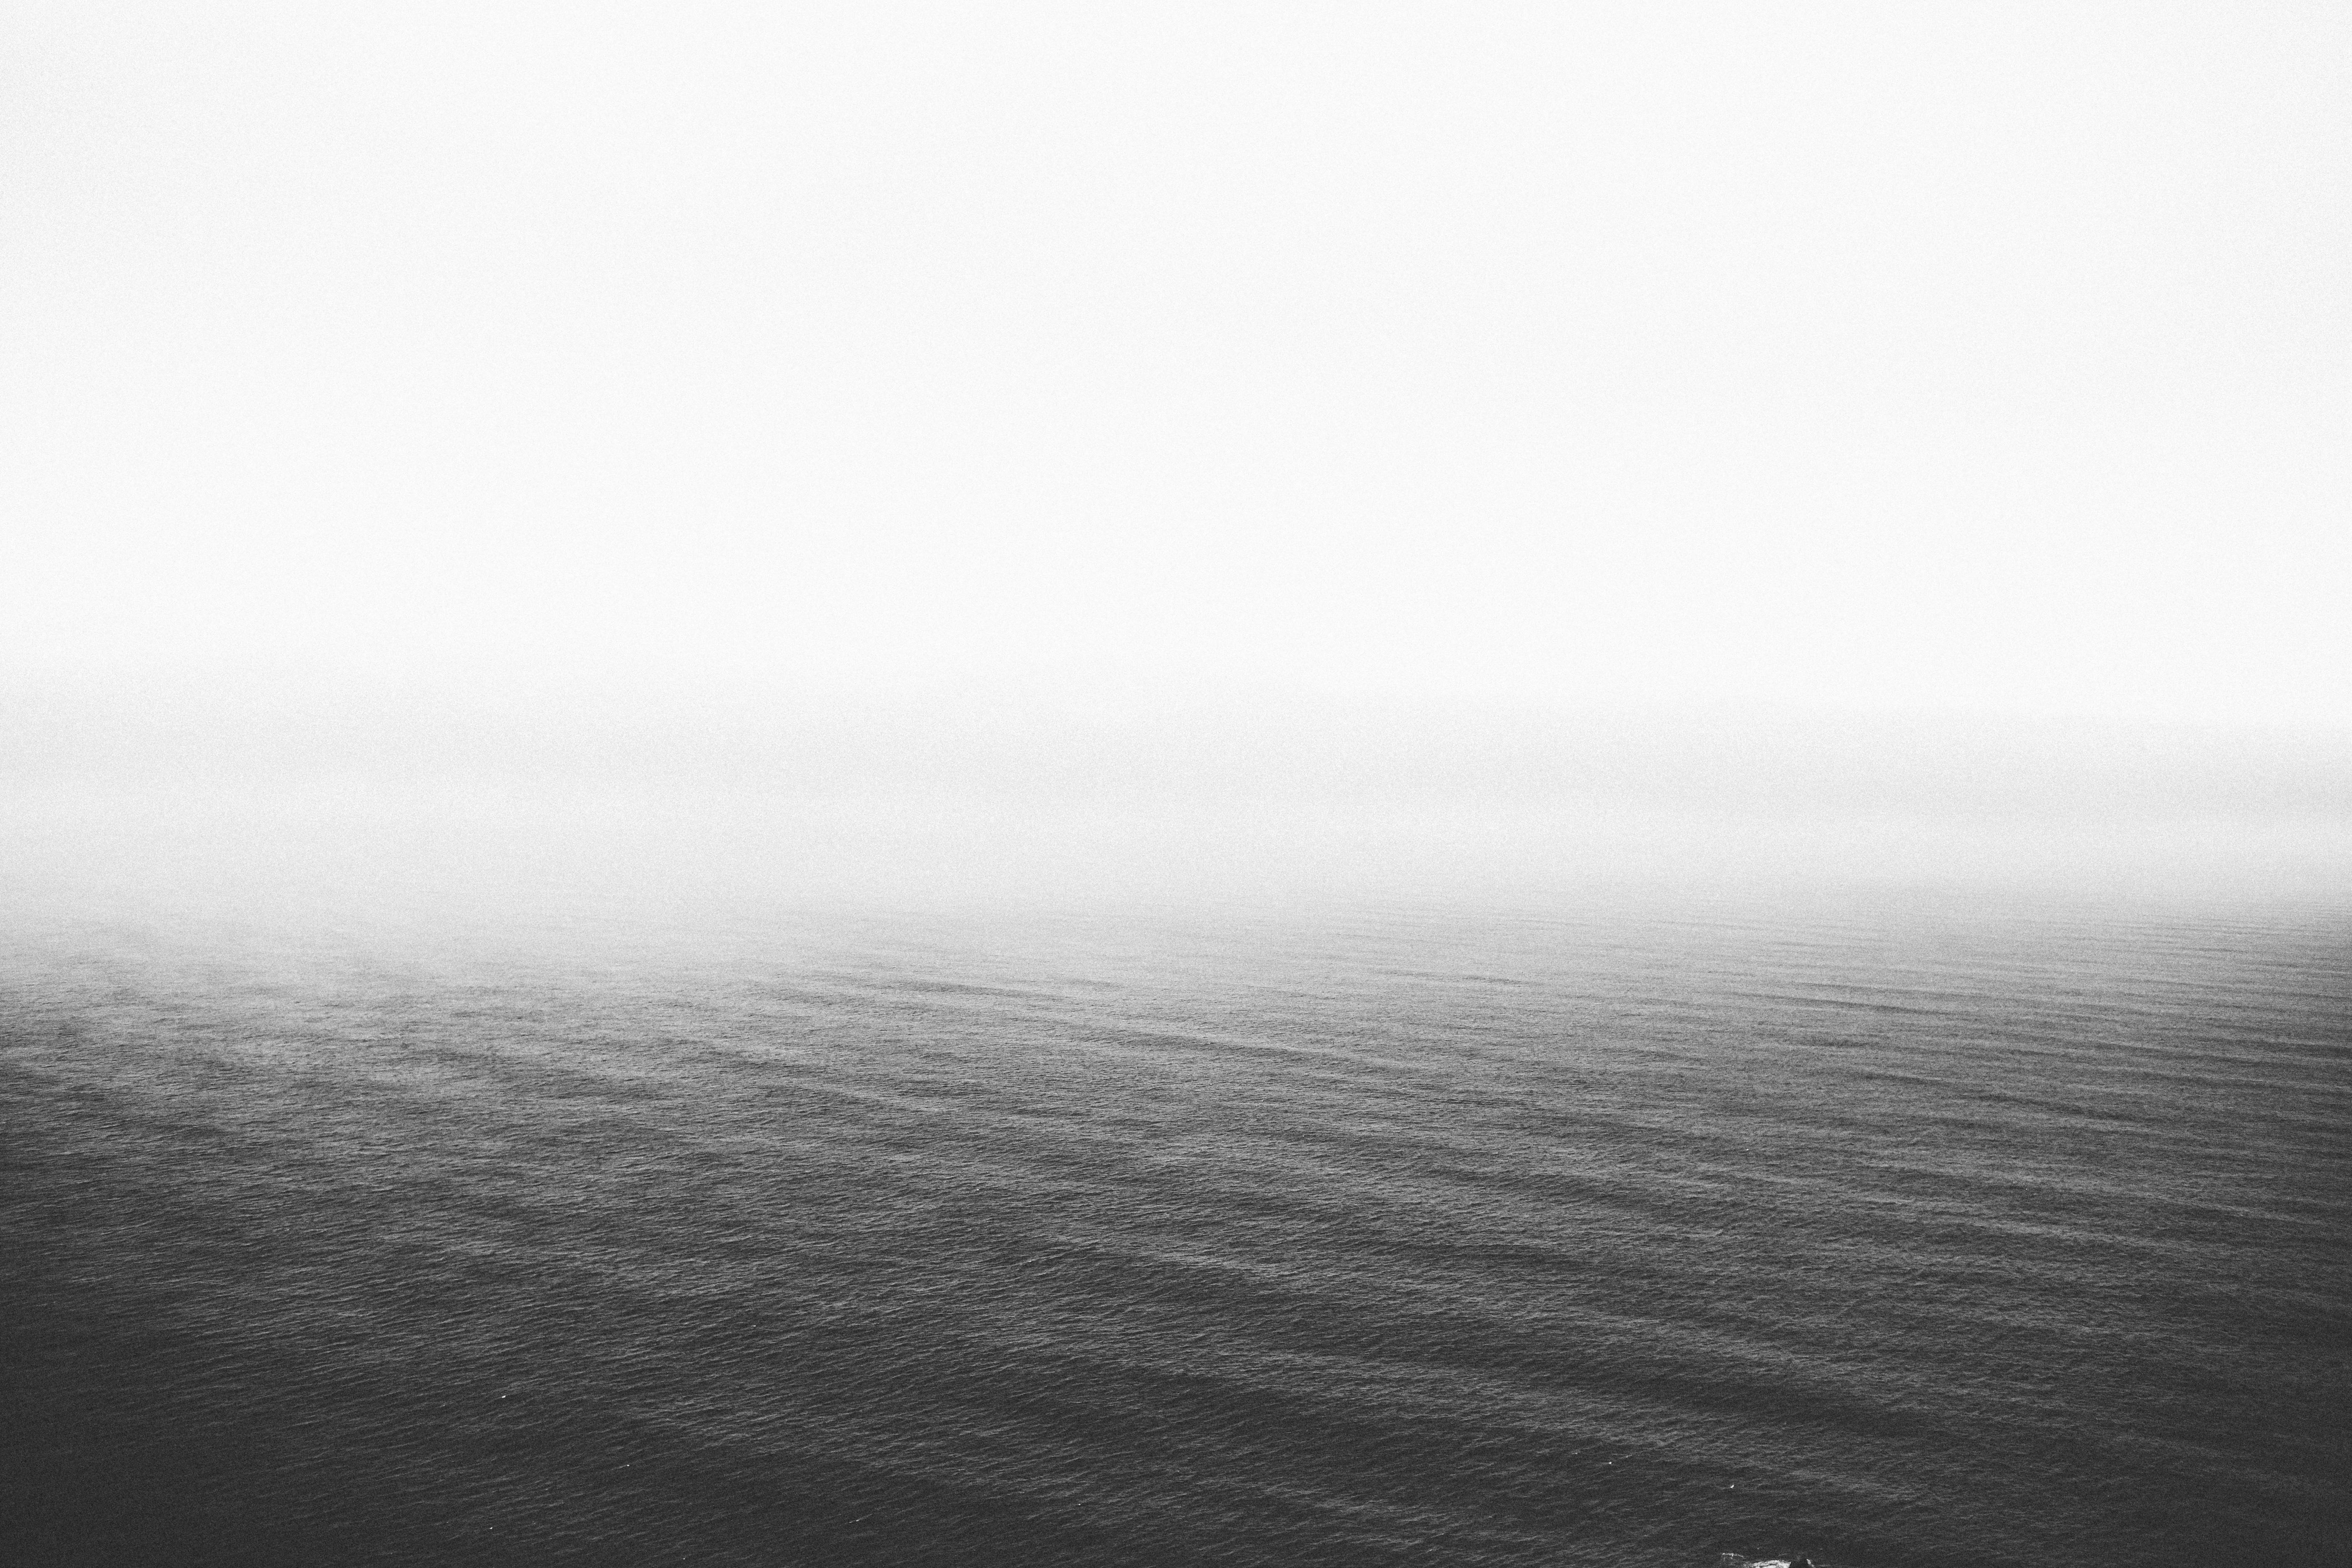 free images sea coast ocean horizon cloud black and white fog mist morning wave dawn. Black Bedroom Furniture Sets. Home Design Ideas